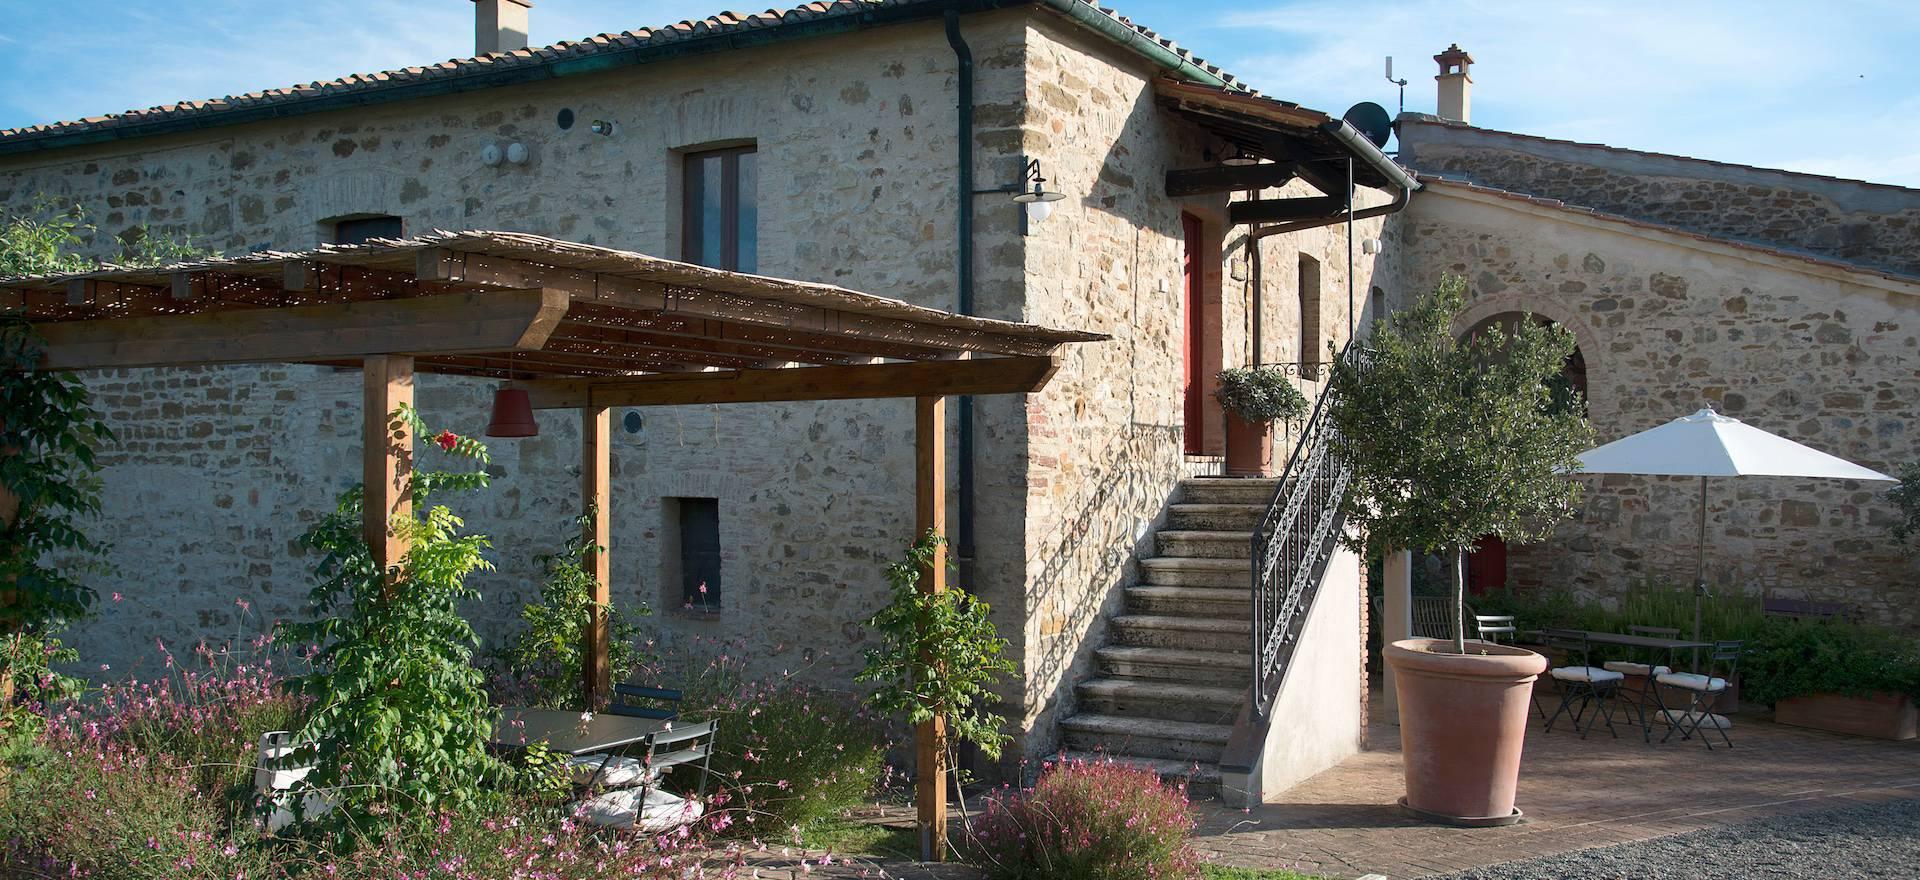 Agriturismo Toscana Agriturismo Toscana con appartamenti ben arredati